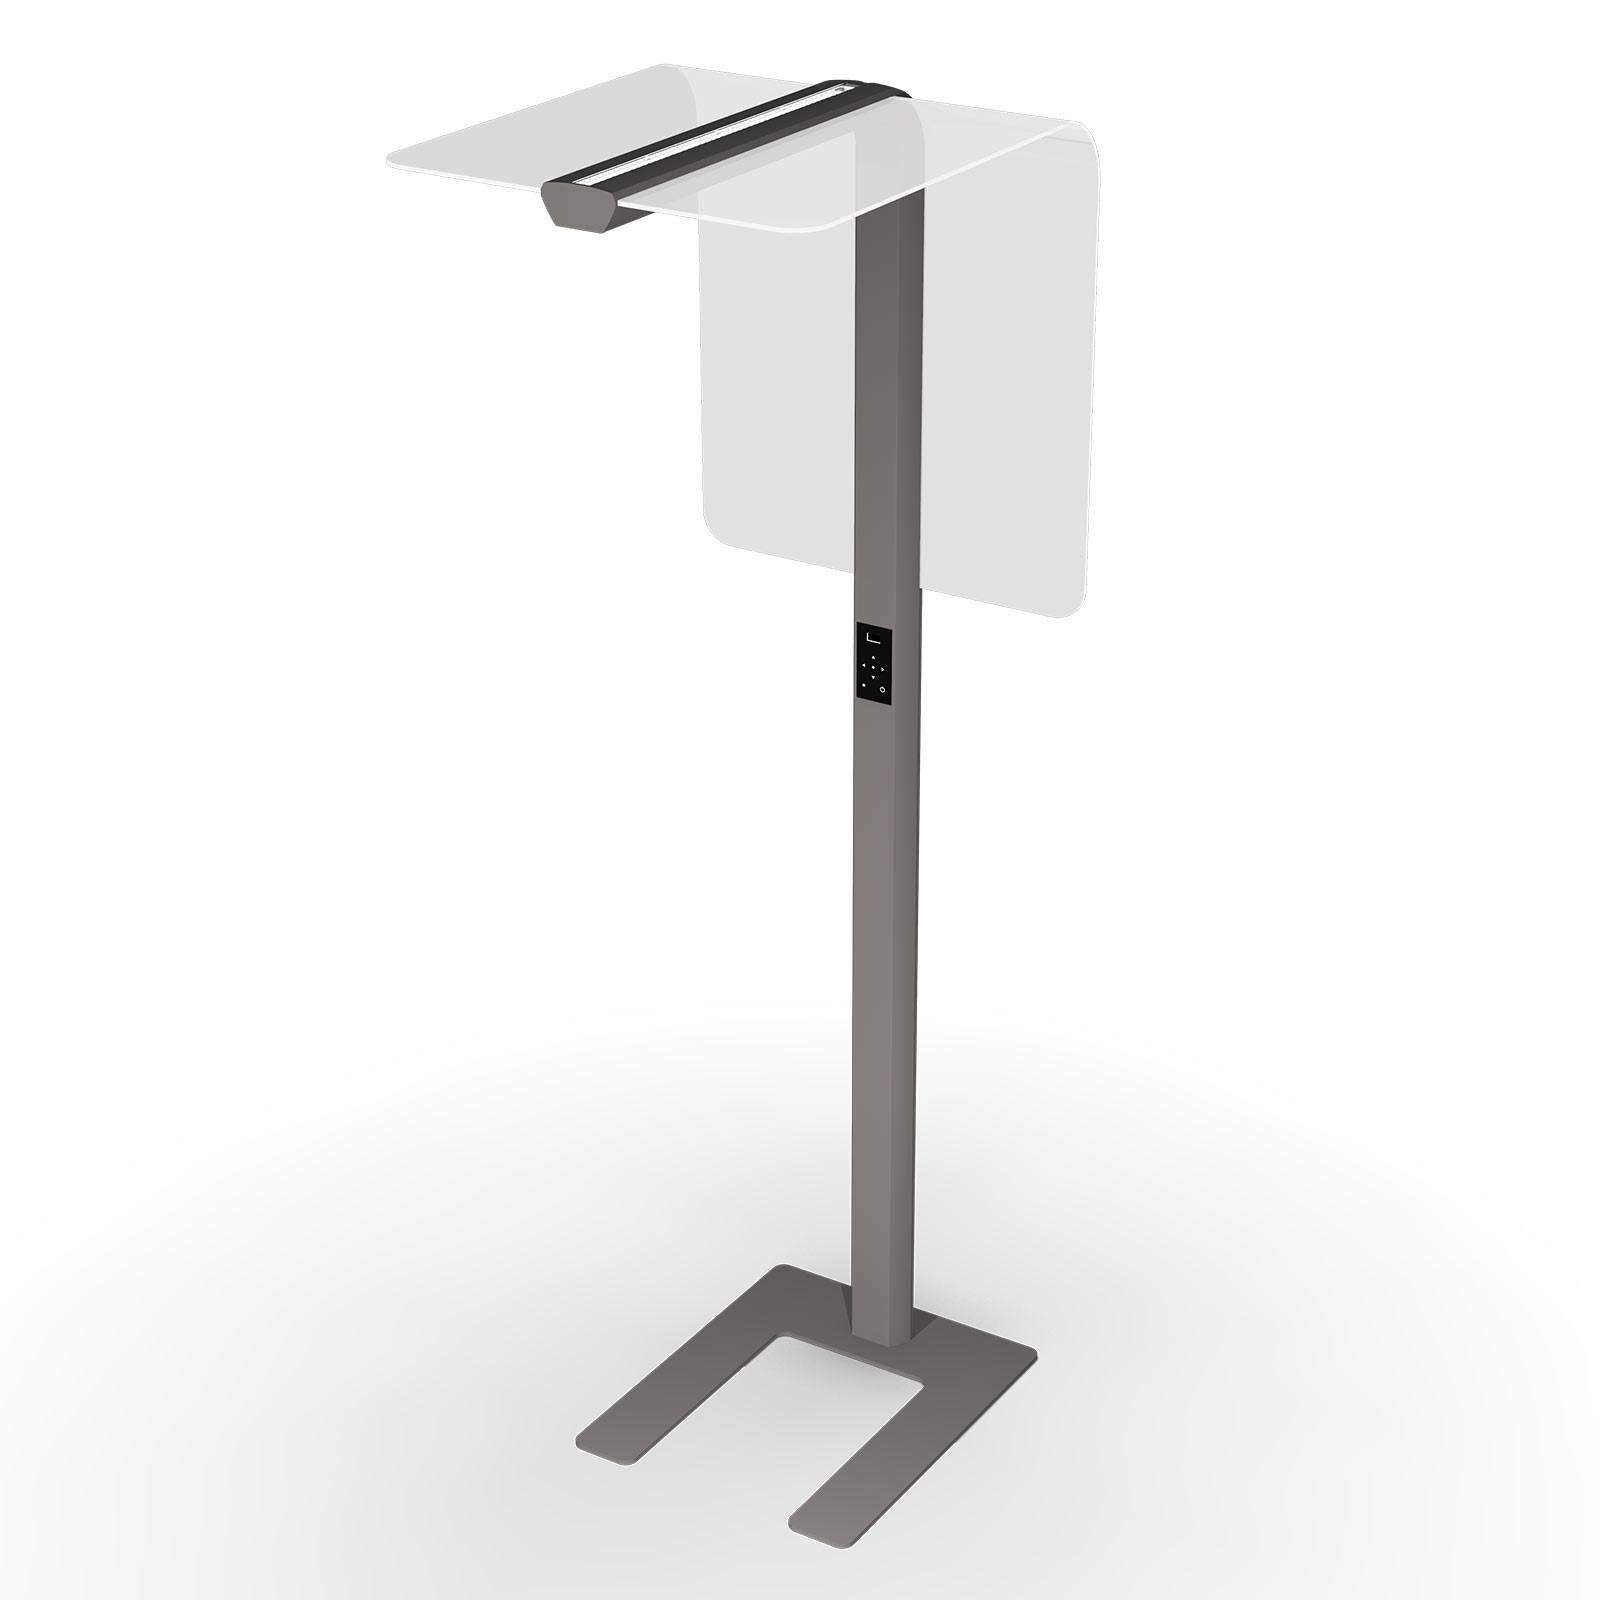 LED-Stehleuchte eva place 2D1E RAL 9006 weißalu